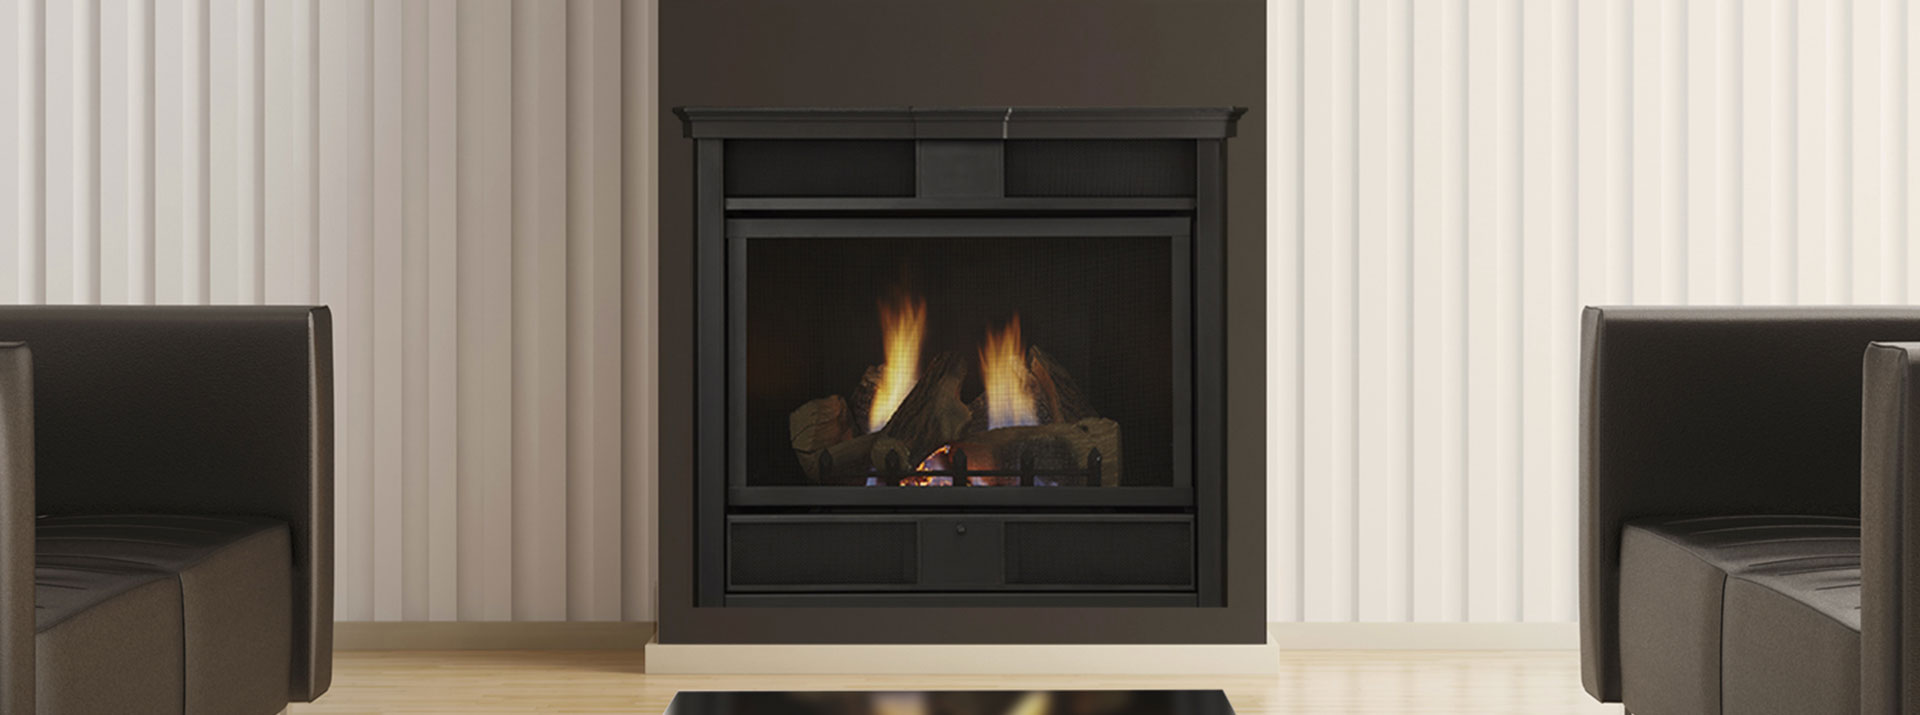 symphony vent free gas fireplace monessen hearth rh monessenhearth com monessen gas logs manual Ventless Gas Fireplace